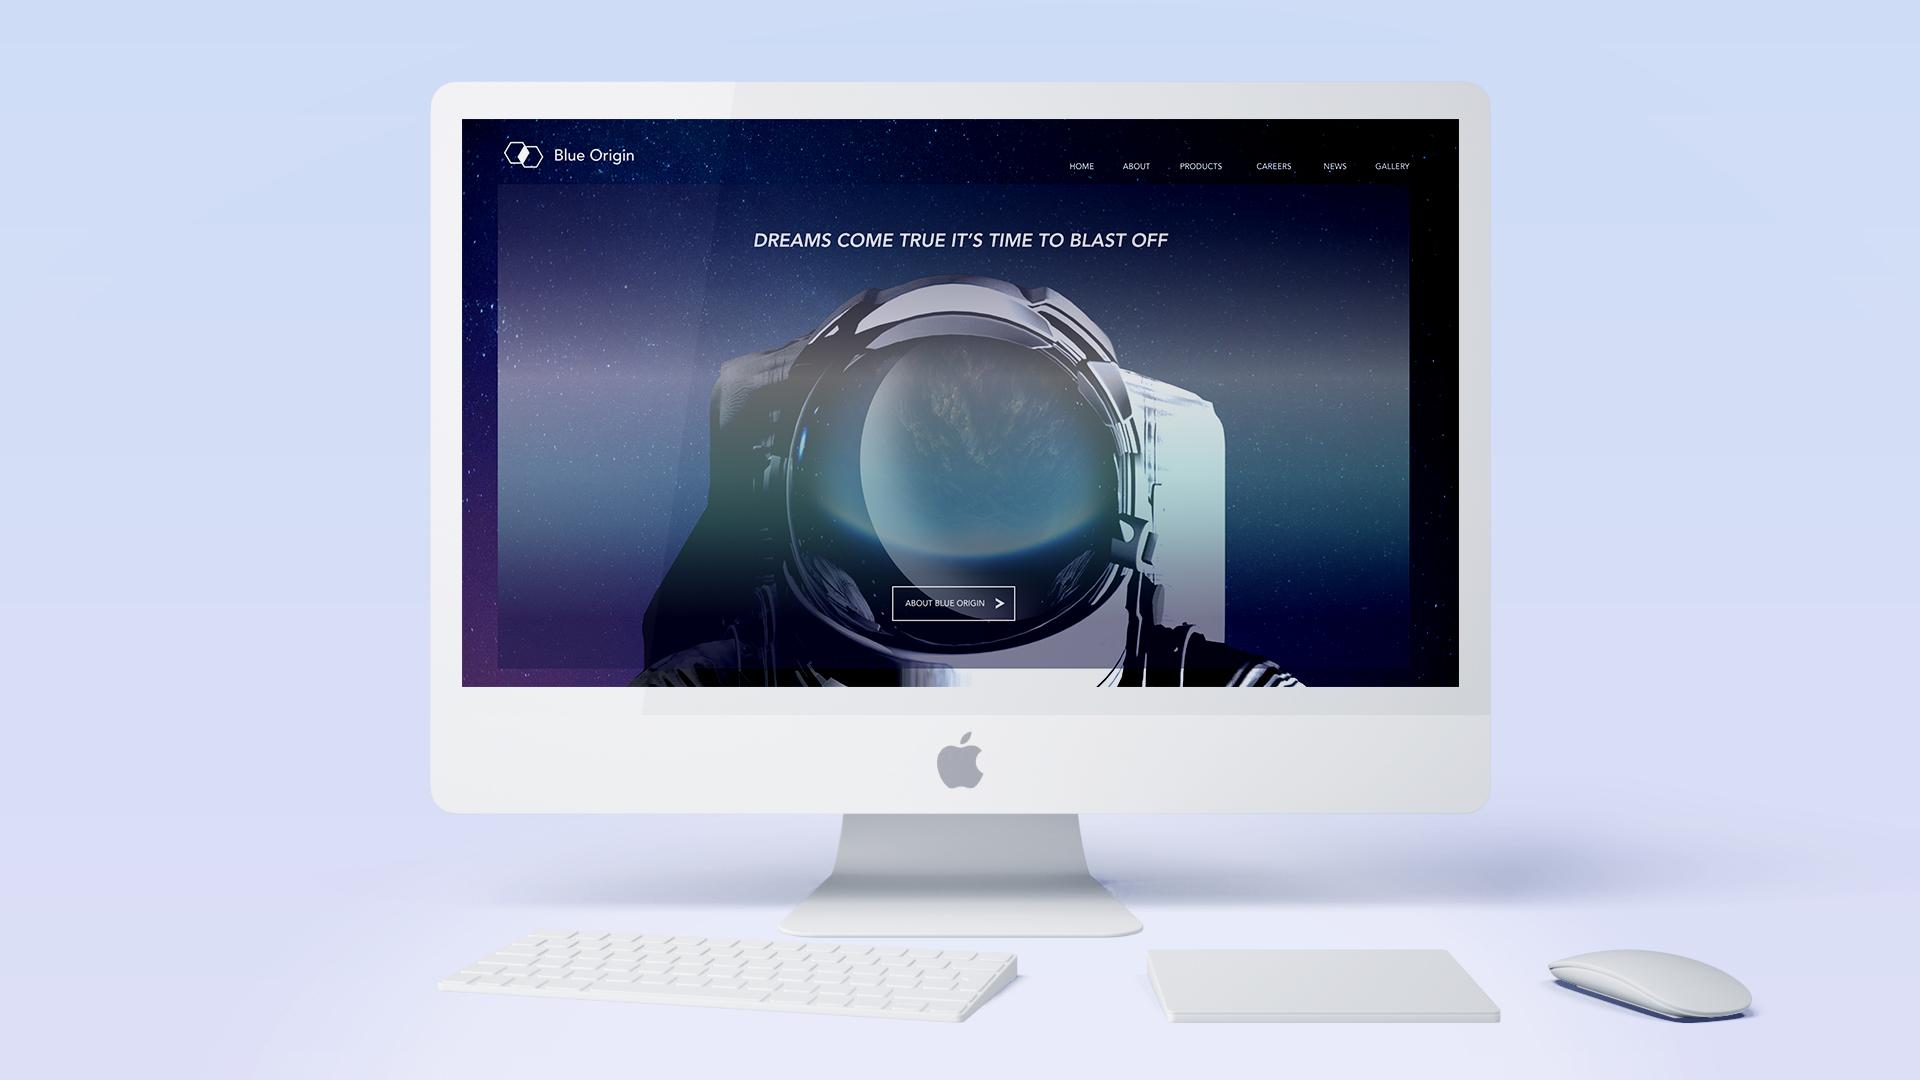 iMac copy.jpg